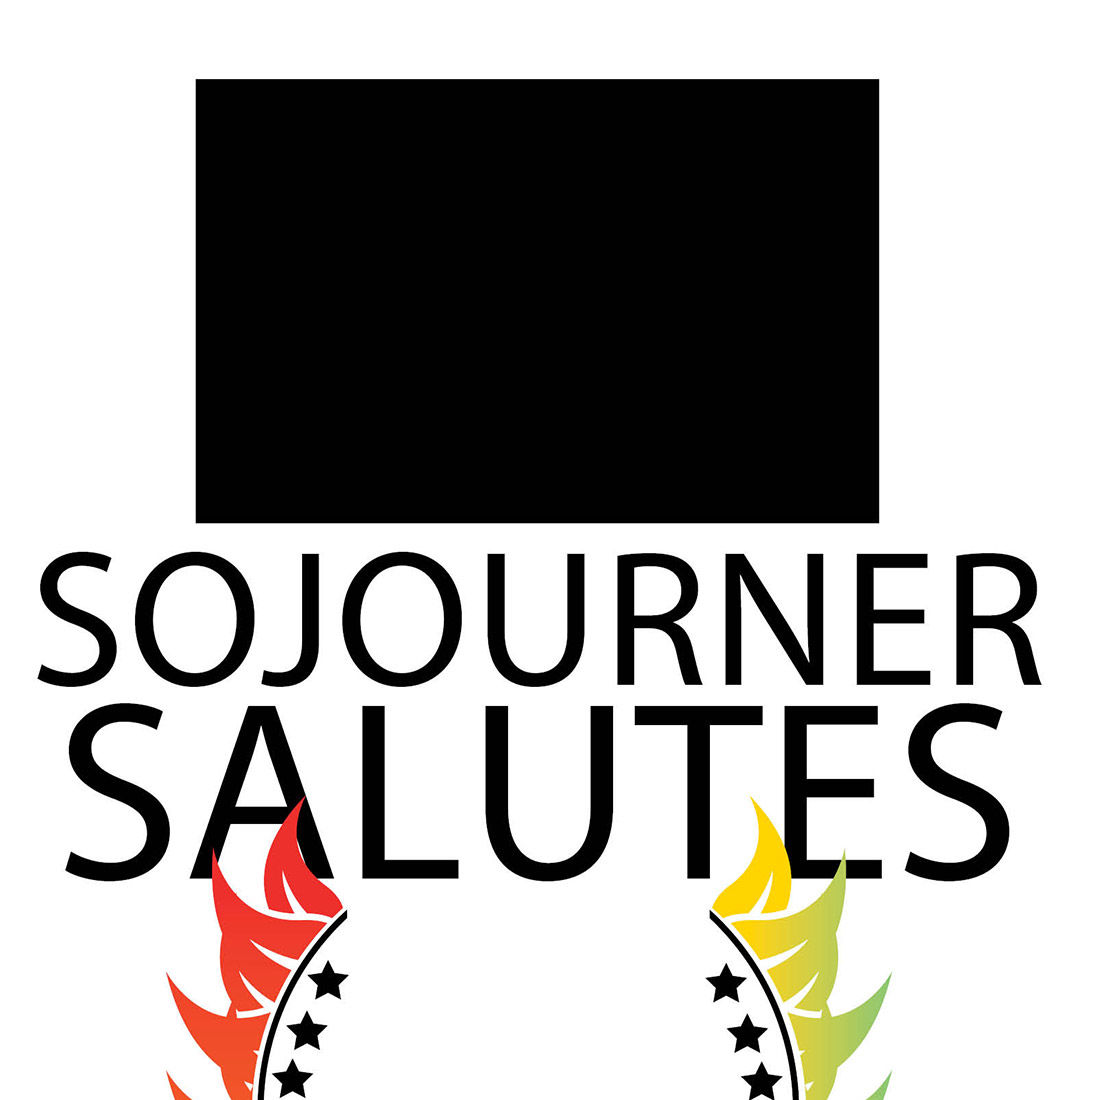 1113 sojourner salutes logo s7zeuy